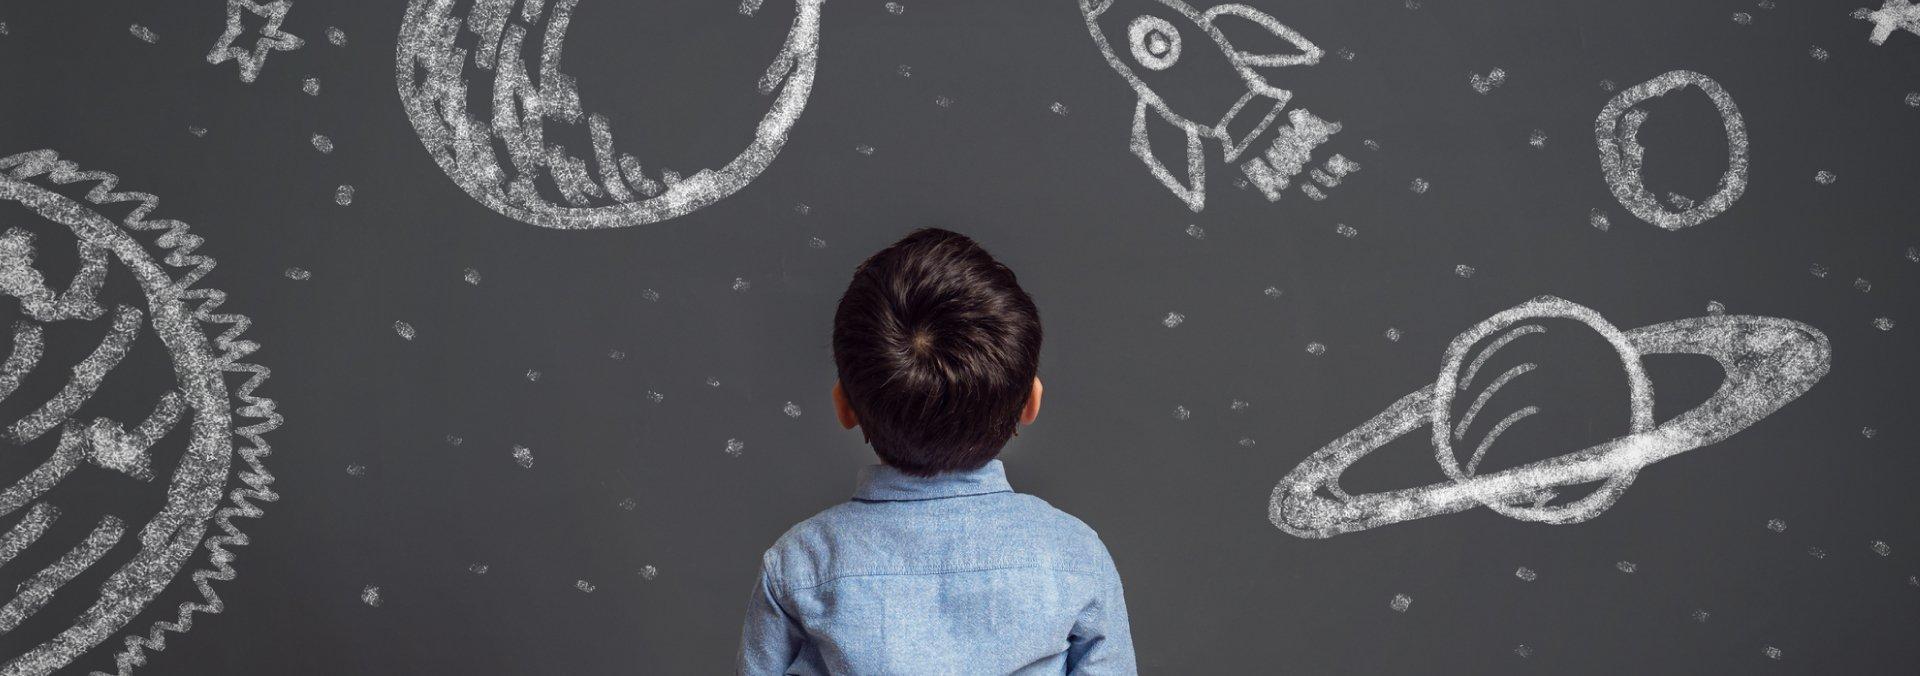 Achieving Childhood Dream